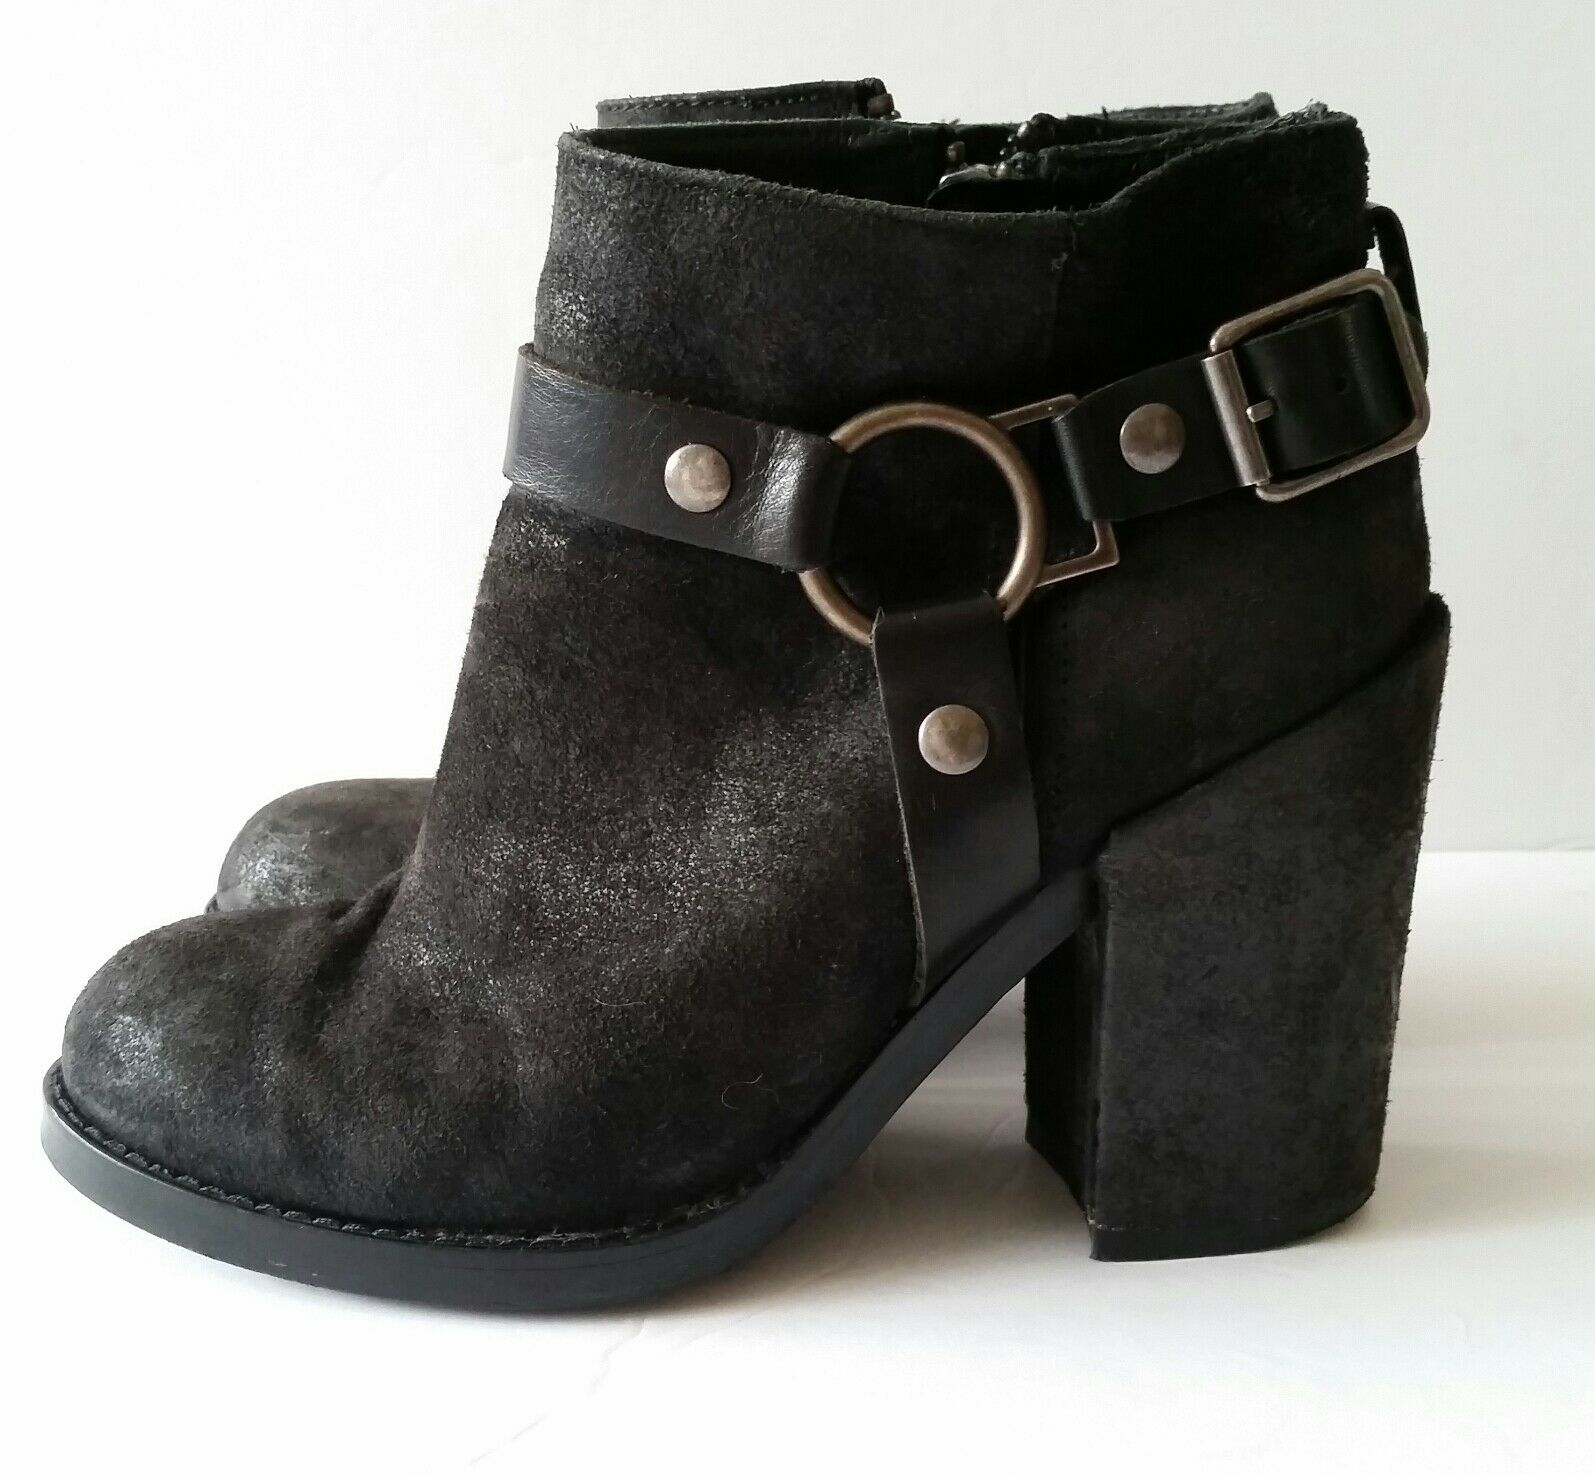 Ash Falcon Black Leather Moto Ankle Boots Women's 37 Harness Heel Bootie EUC 298